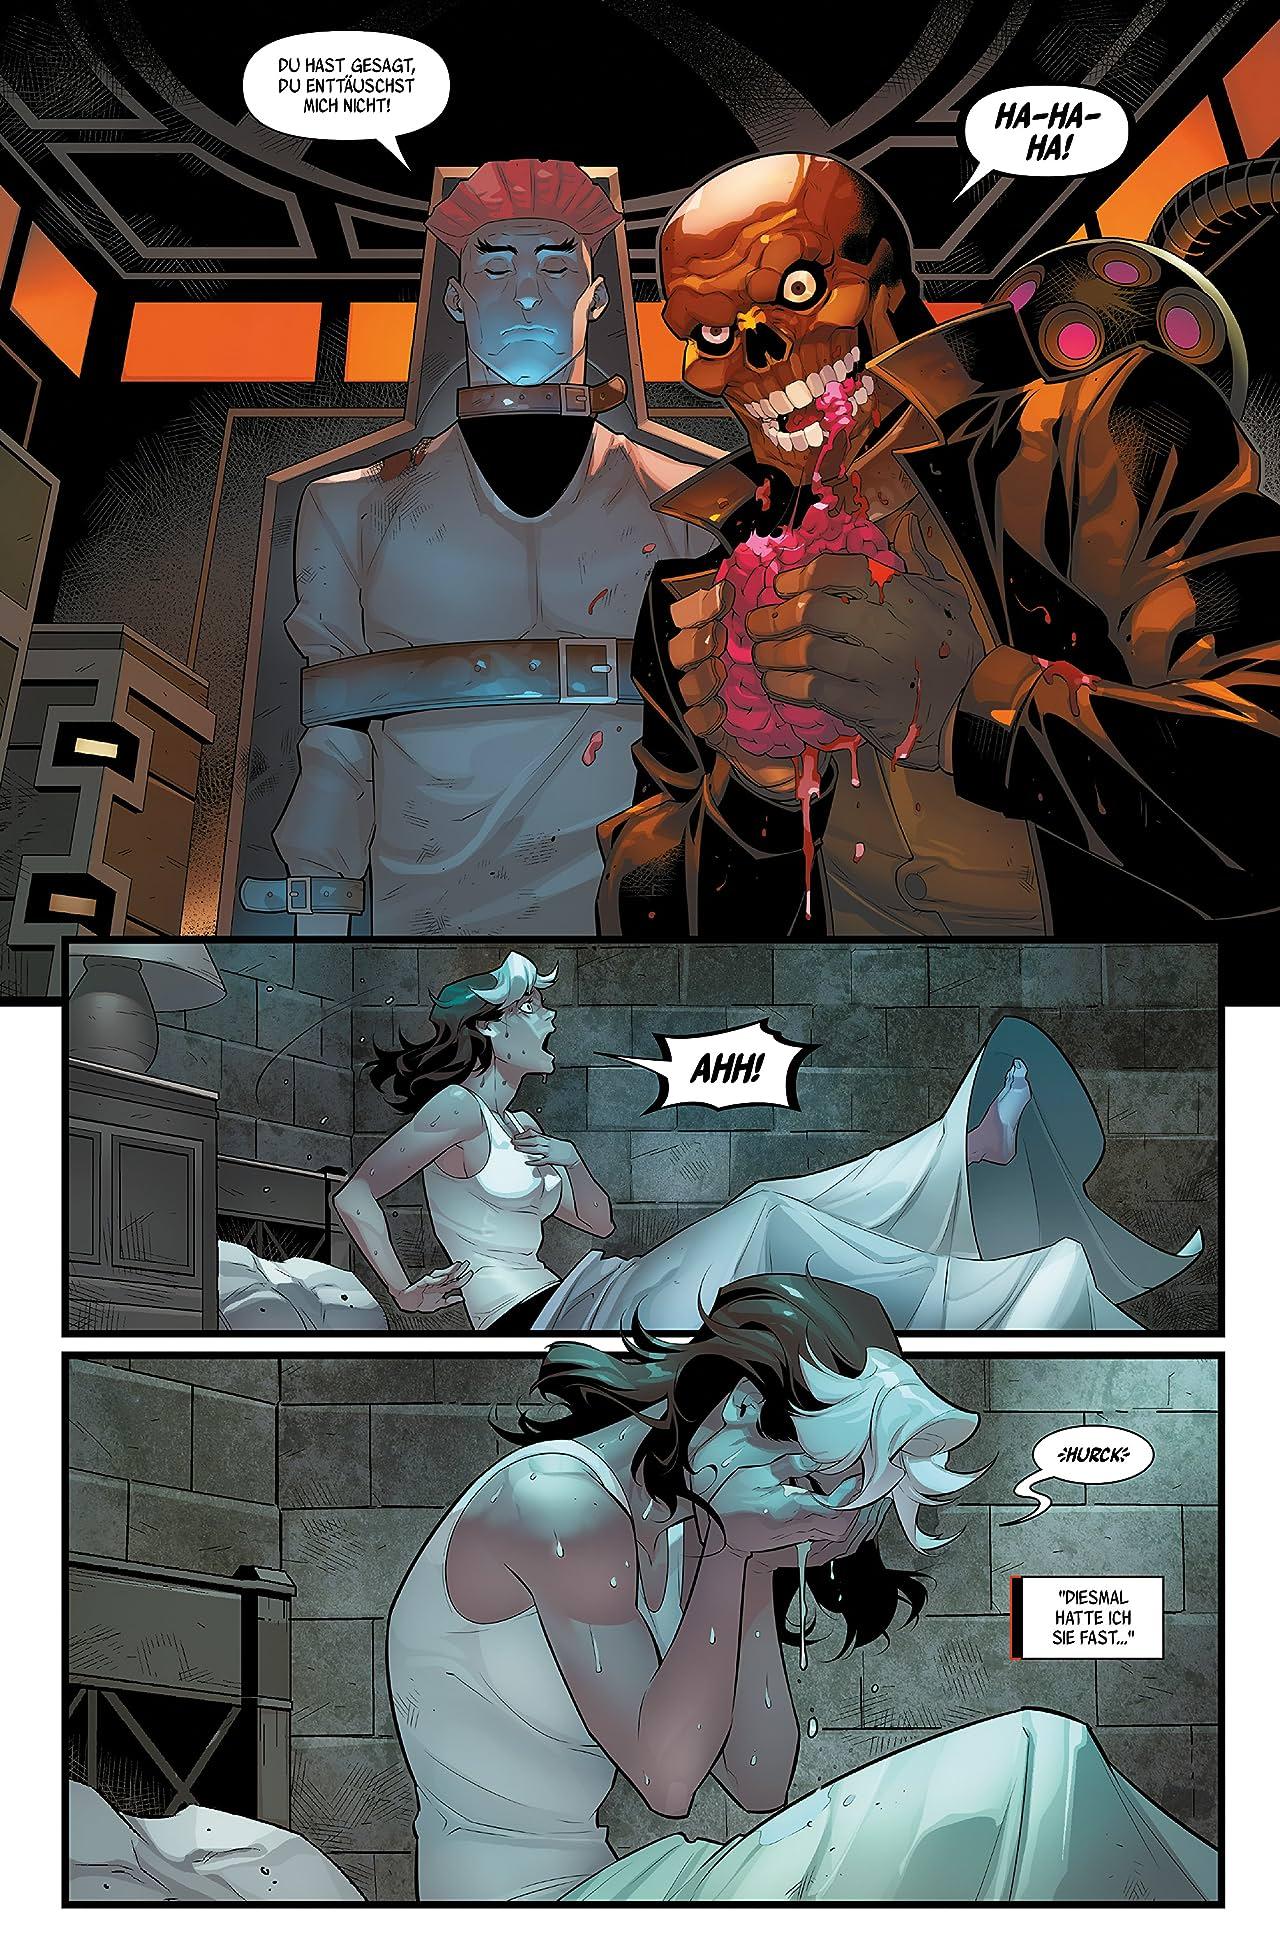 Uncanny Avengers Vol. 5: In den Klauen von Red Skull